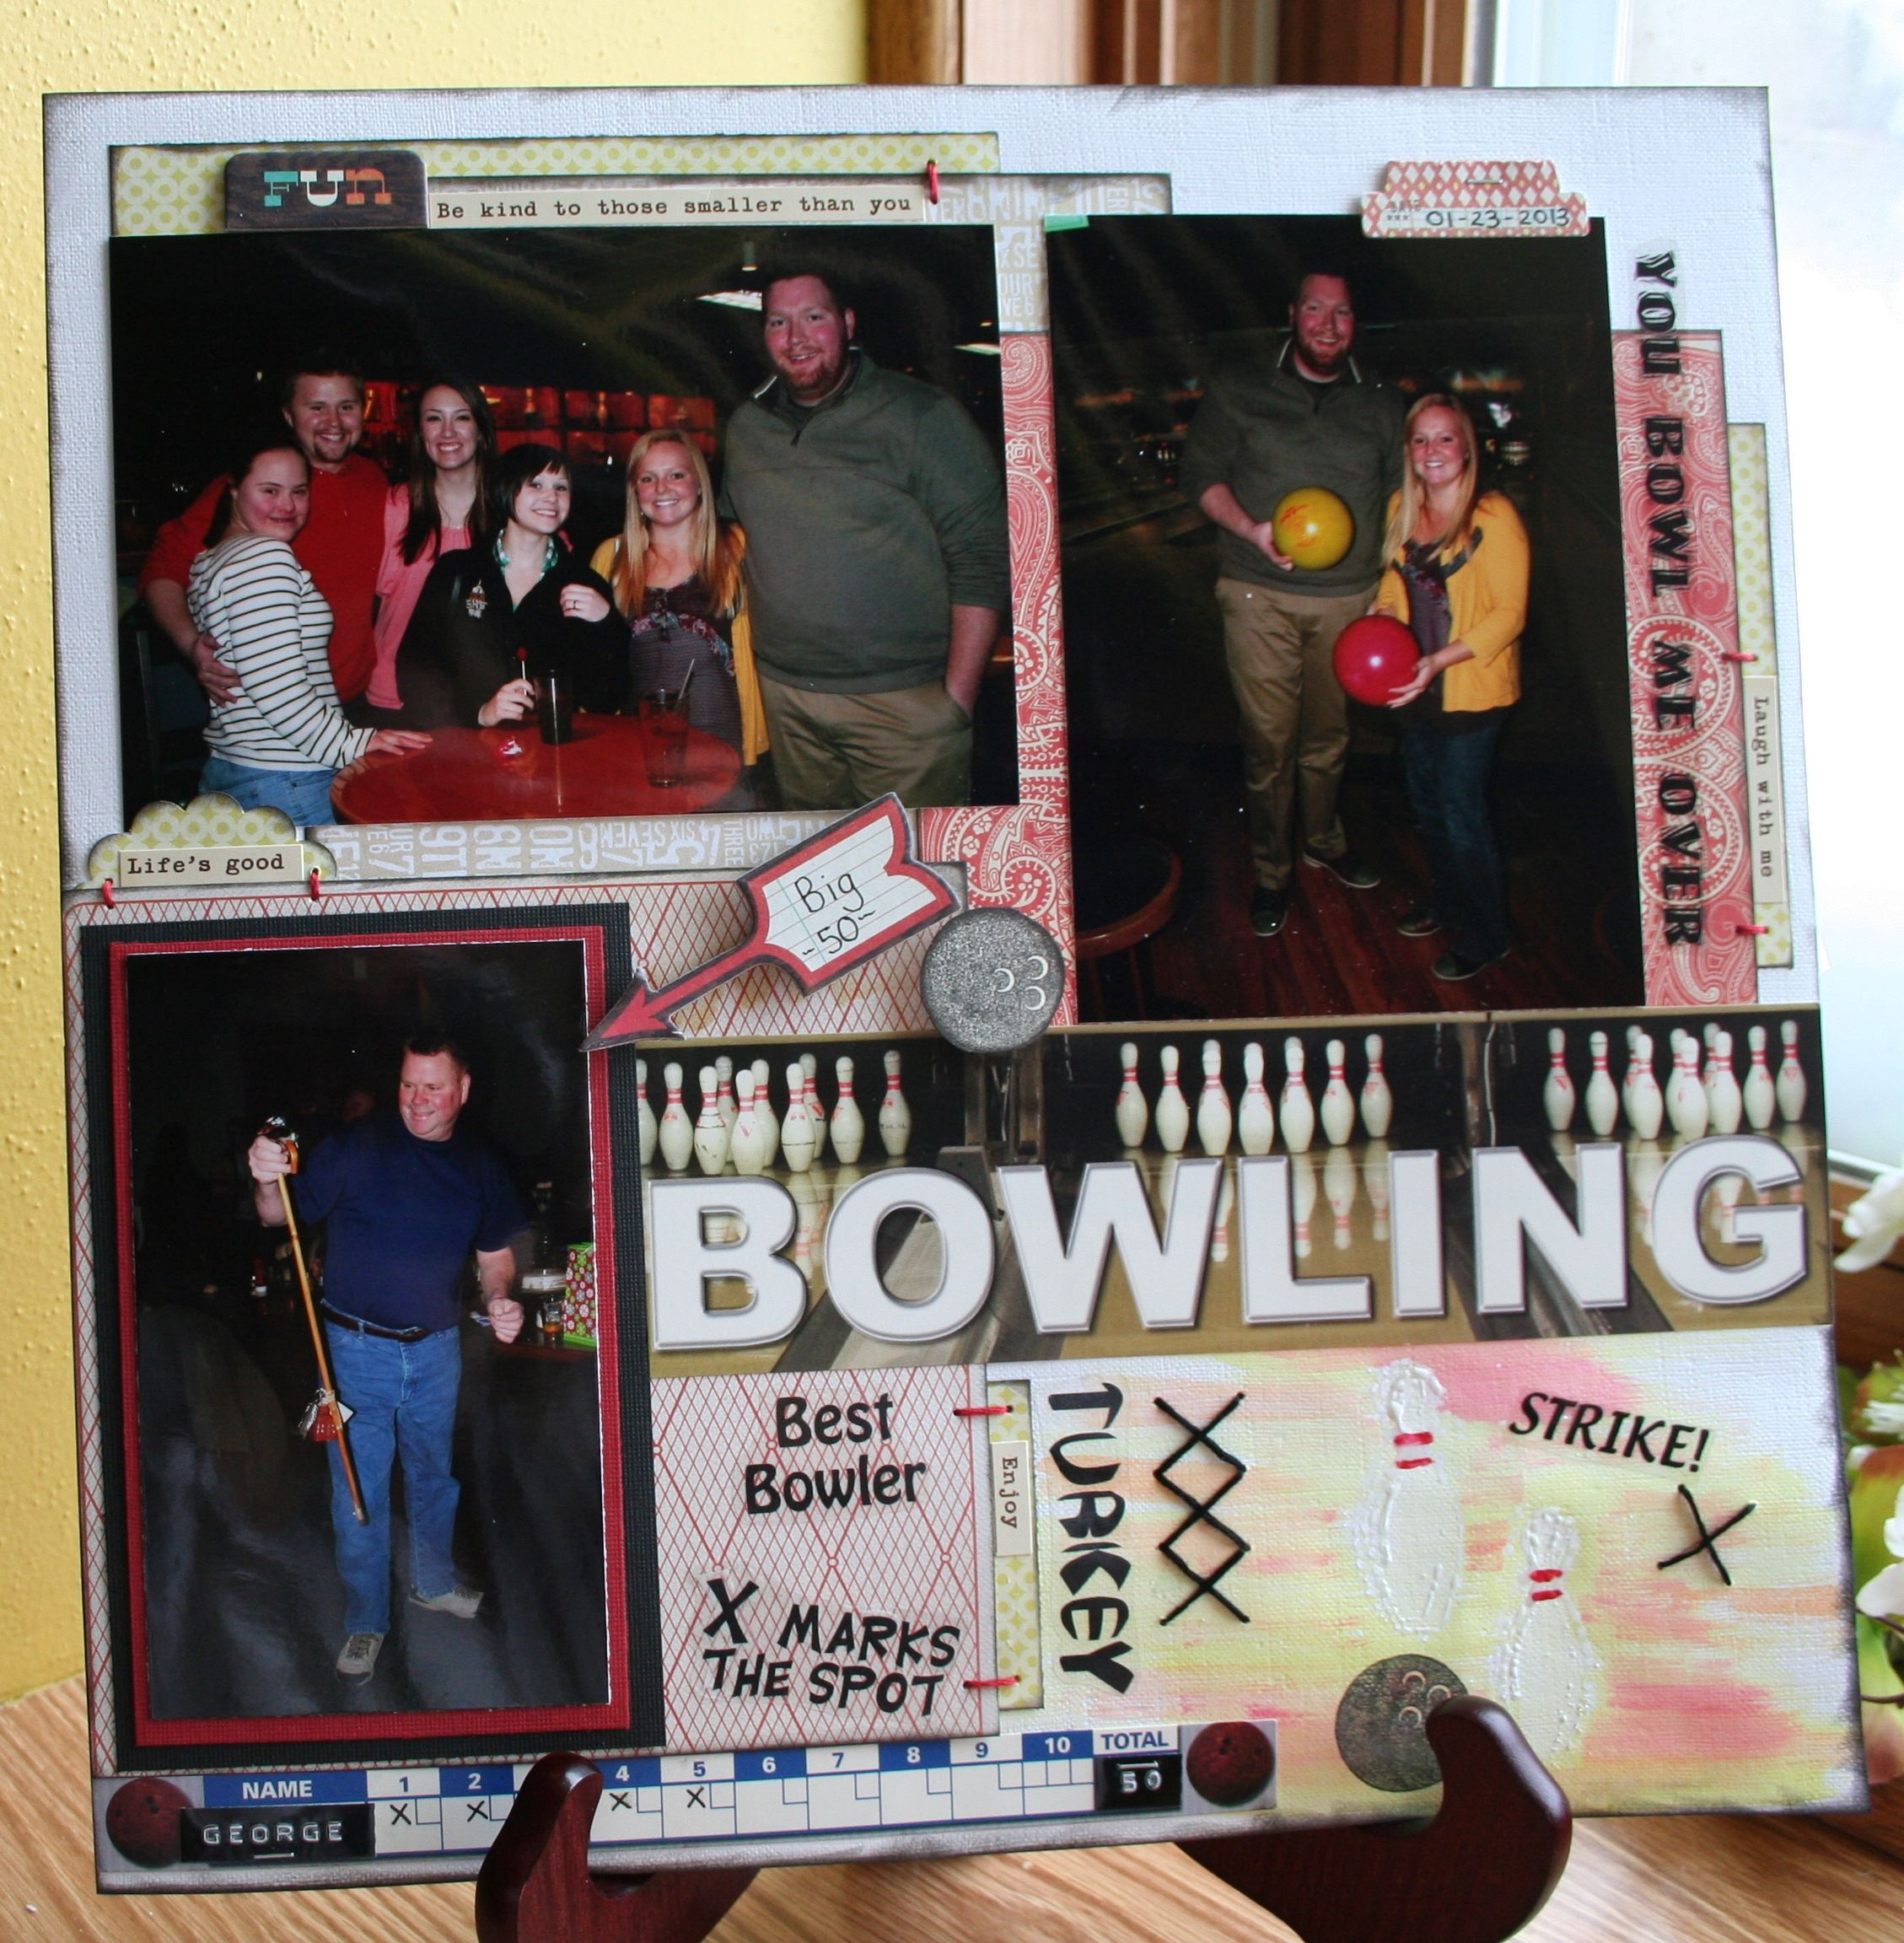 Family scrapbook ideas on pinterest - Bowling Scrapbook Com